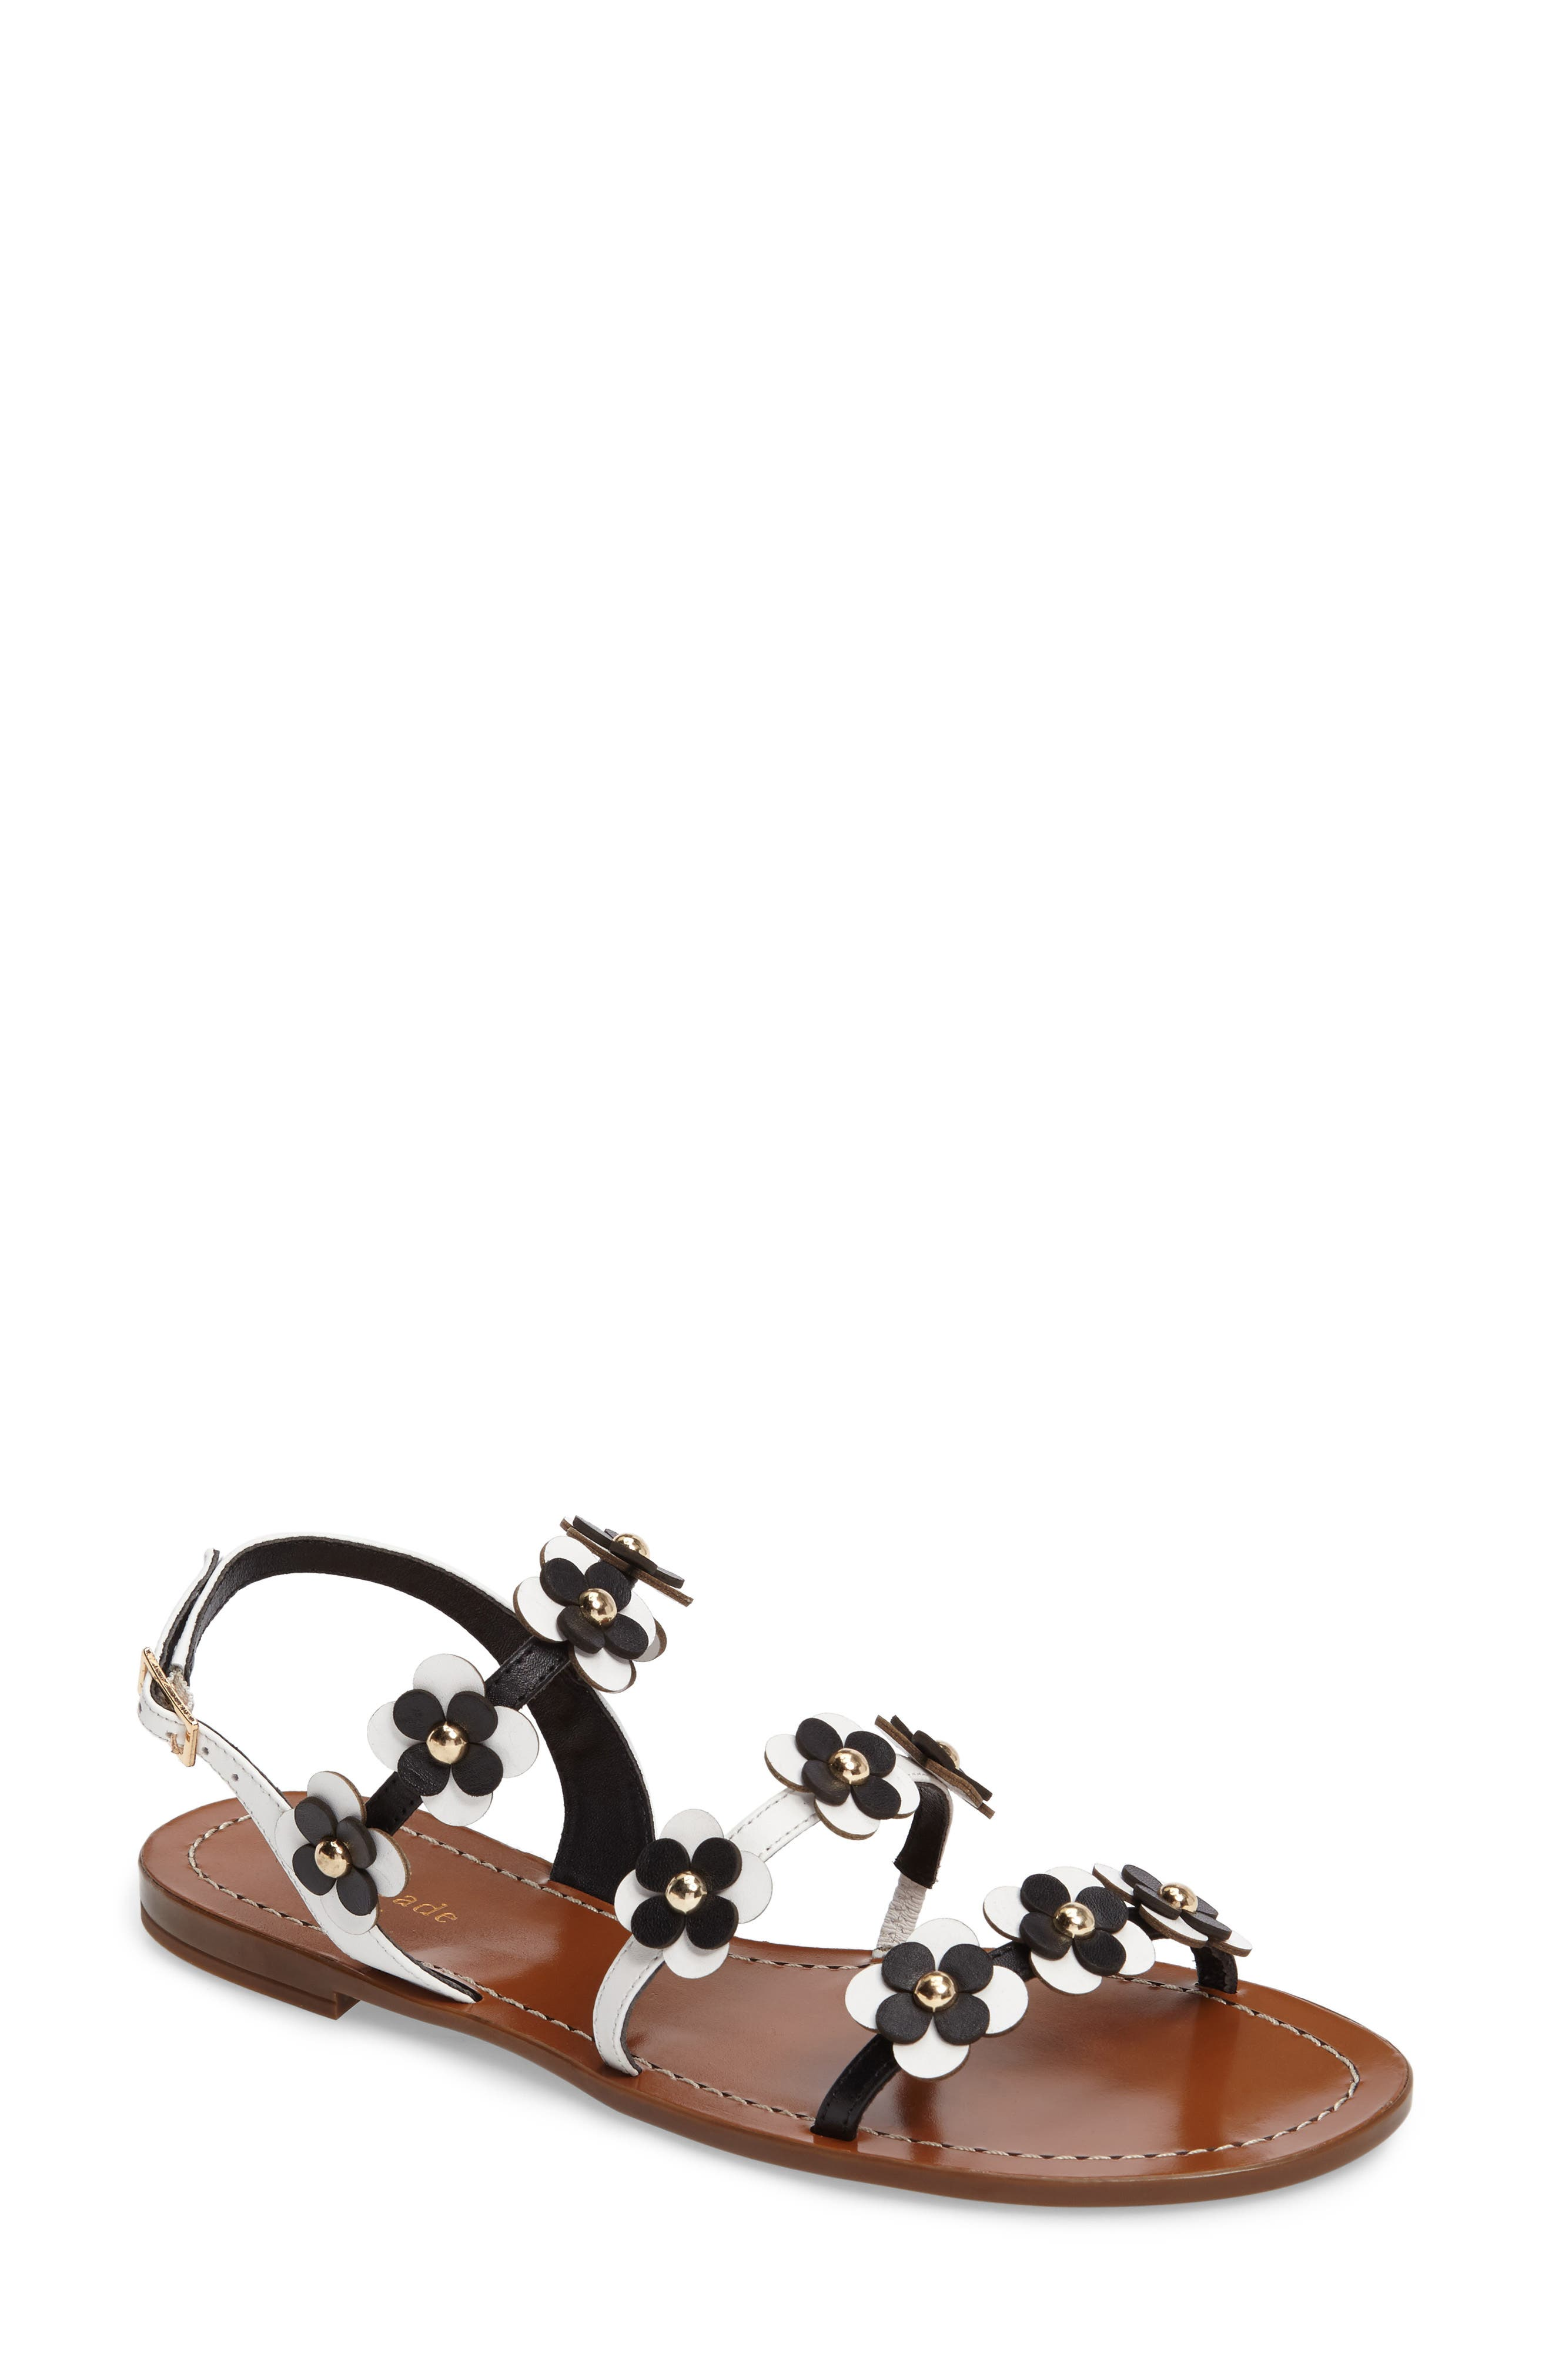 Alternate Image 1 Selected - kate spade new york colorado flowered sandal (Women)